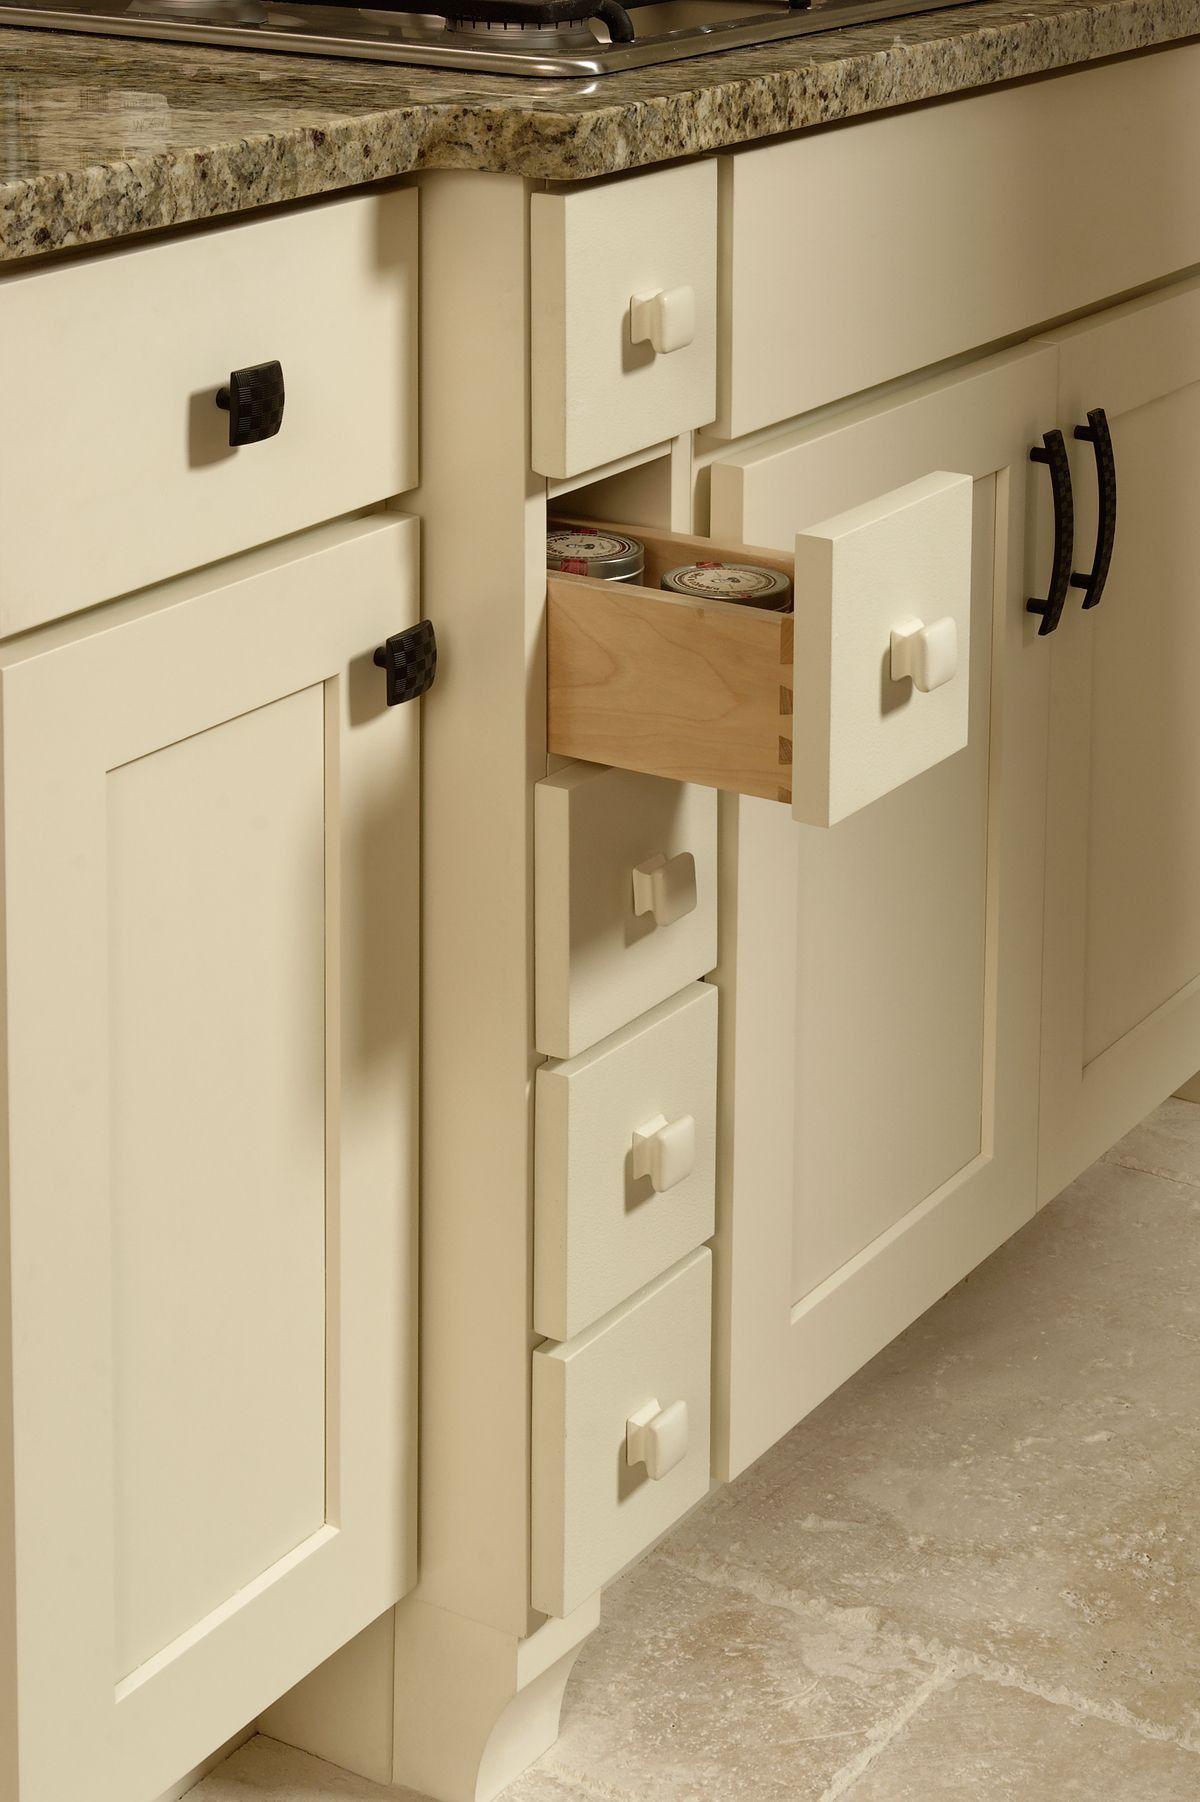 Home Depot Kitchen Cabinet Doors 2020 In 2020 Contemporary Kitchen Cabinets Kitchen Cabinet Doors Kitchen Cabinet Storage